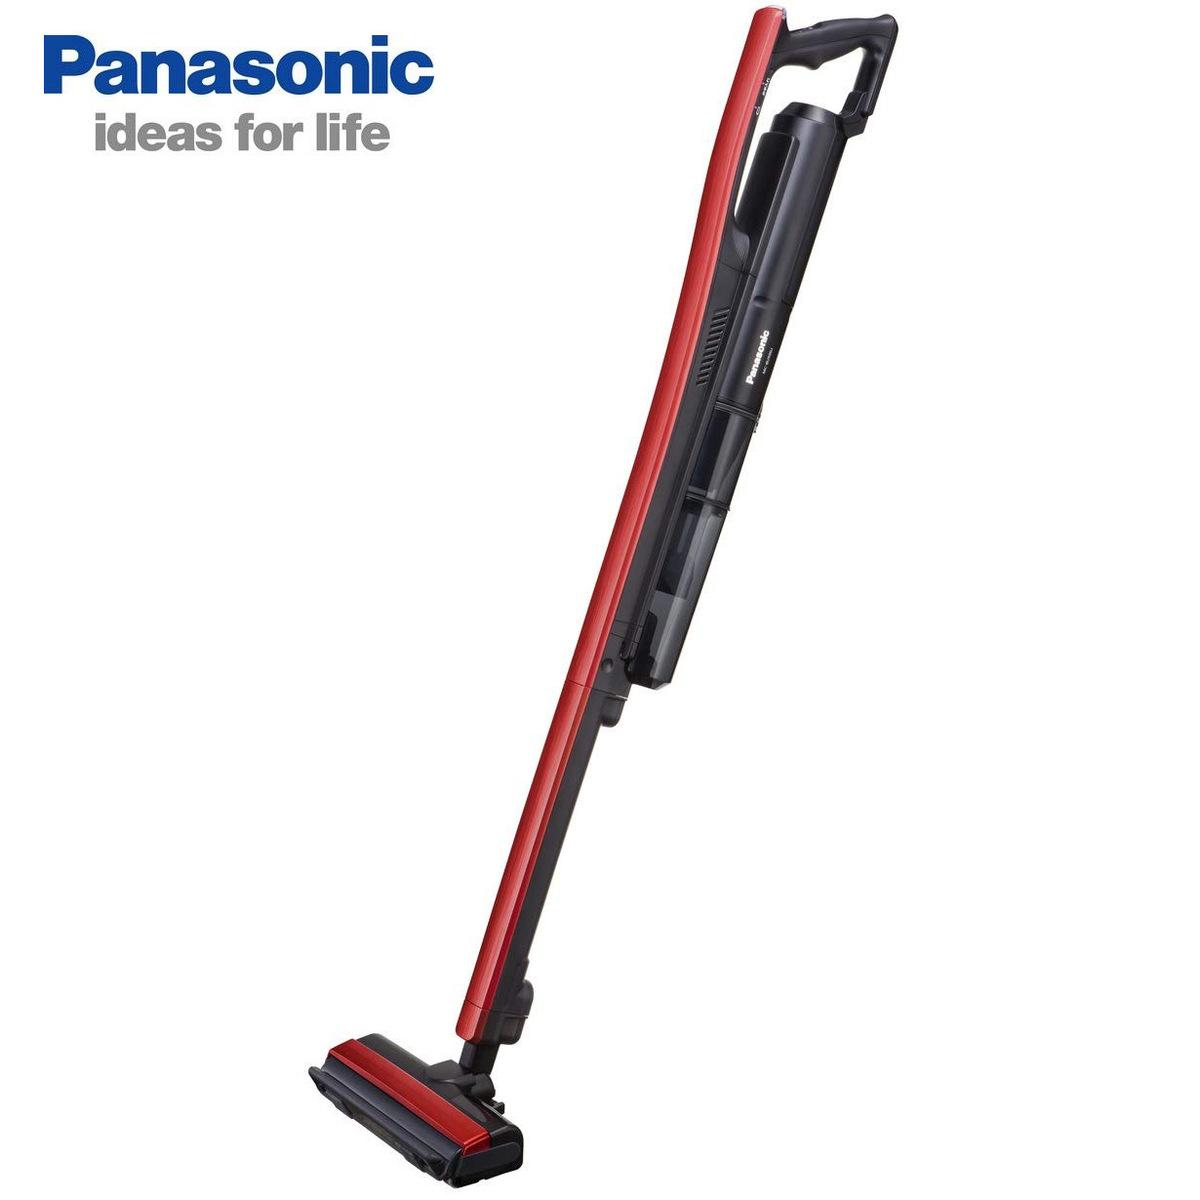 Panasonic コードレス 掃除機 スティッククリーナー 充電式 イット レッドブラック MC-BU500J-R パナソニック 【SG】